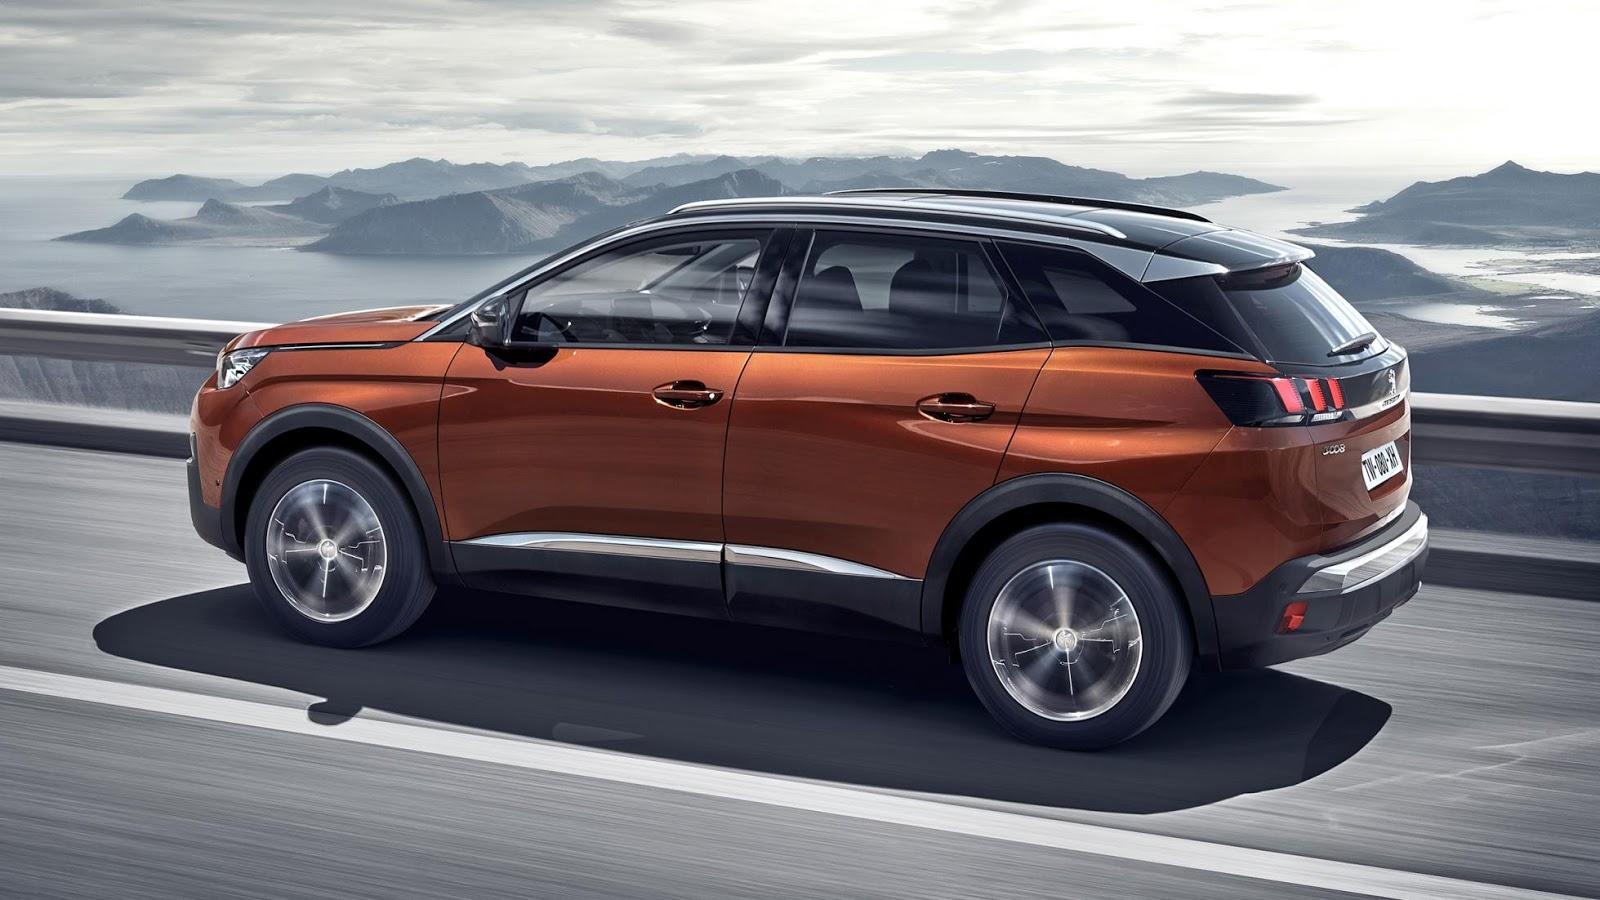 peugeot 3008 Φουλ επίθεση από την Peugeot με τρία νέα SUV! autoshow, PARIS MOTOR SHOW, Peugeot, SUV, videos